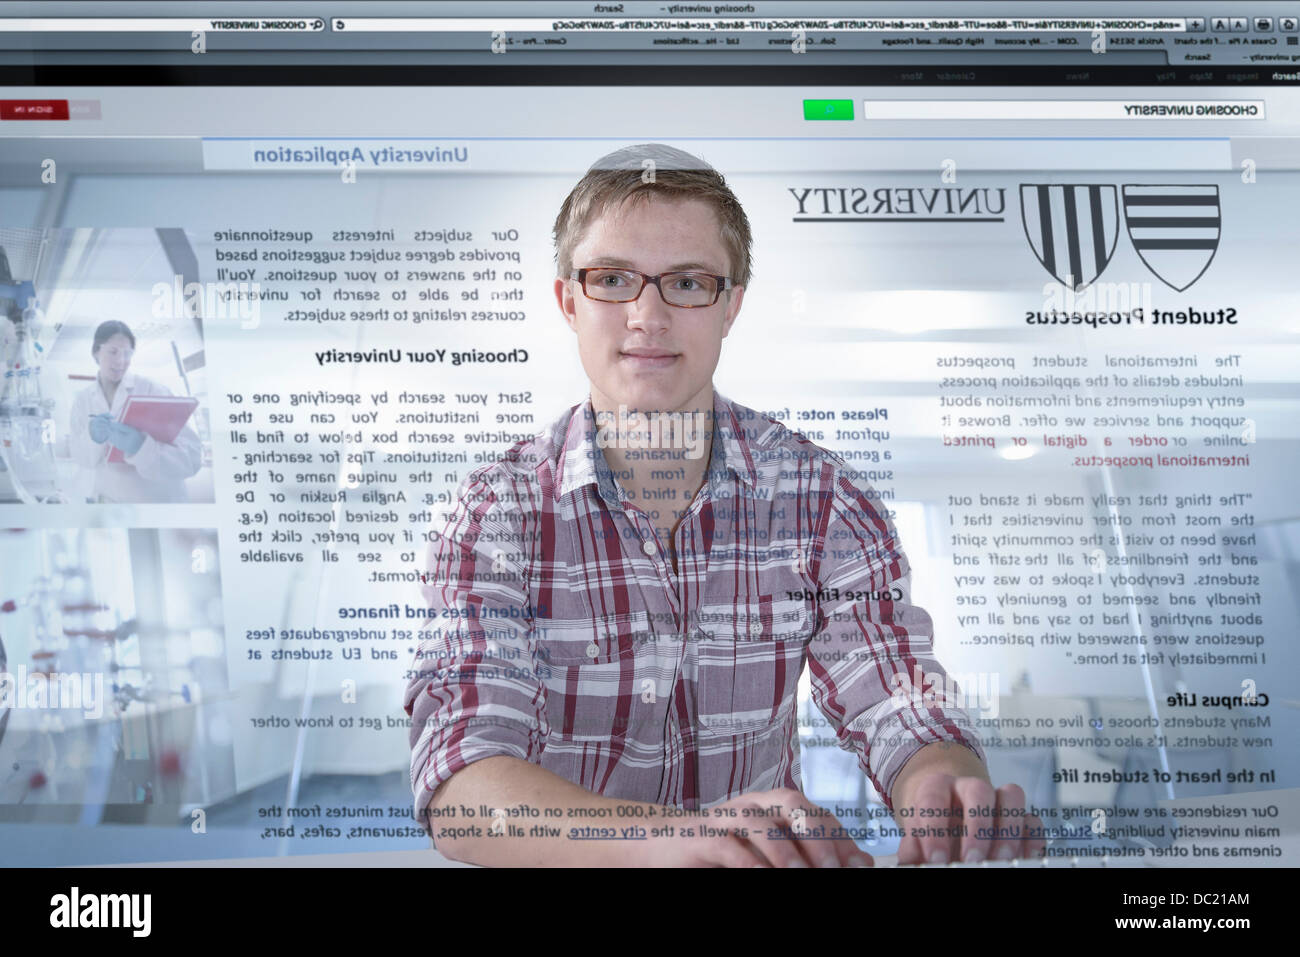 Junger Student Universität Prospekt auf dem Bildschirm betrachten Stockbild